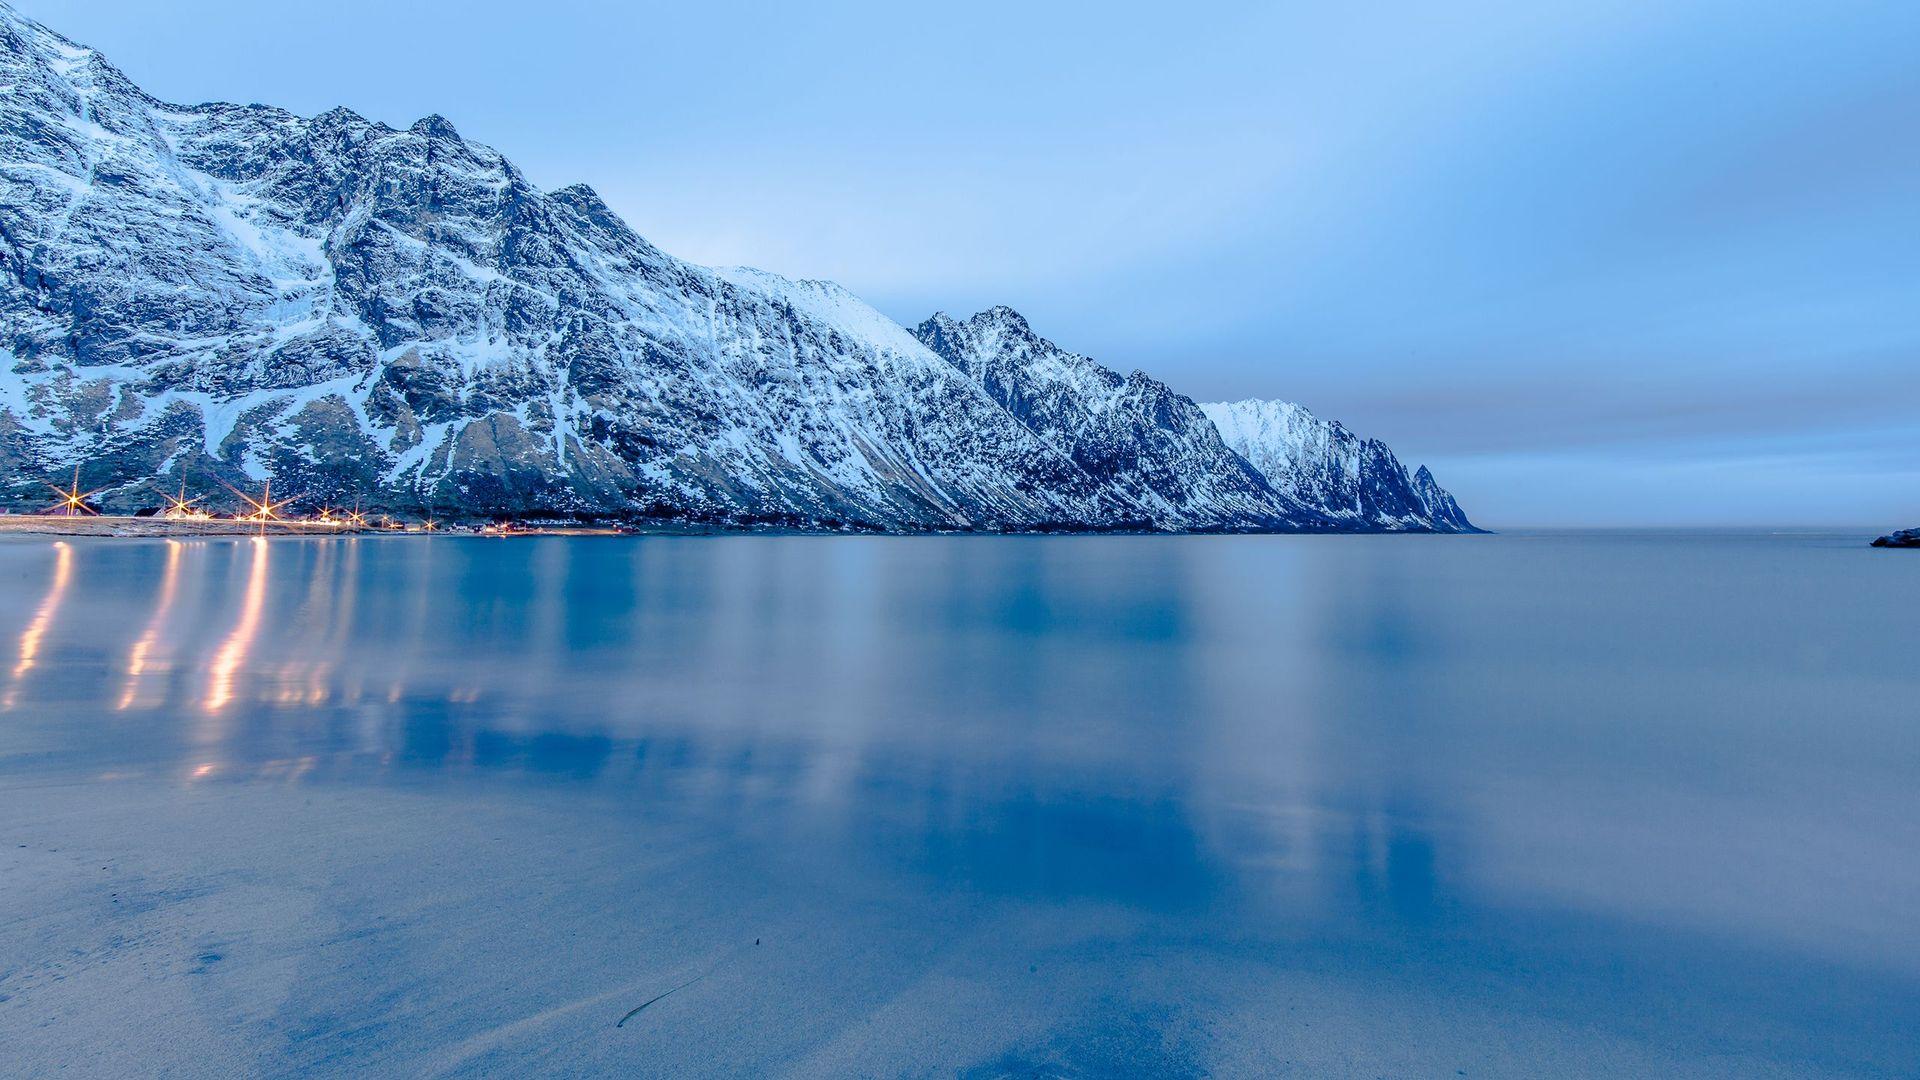 Frozen Lake Background